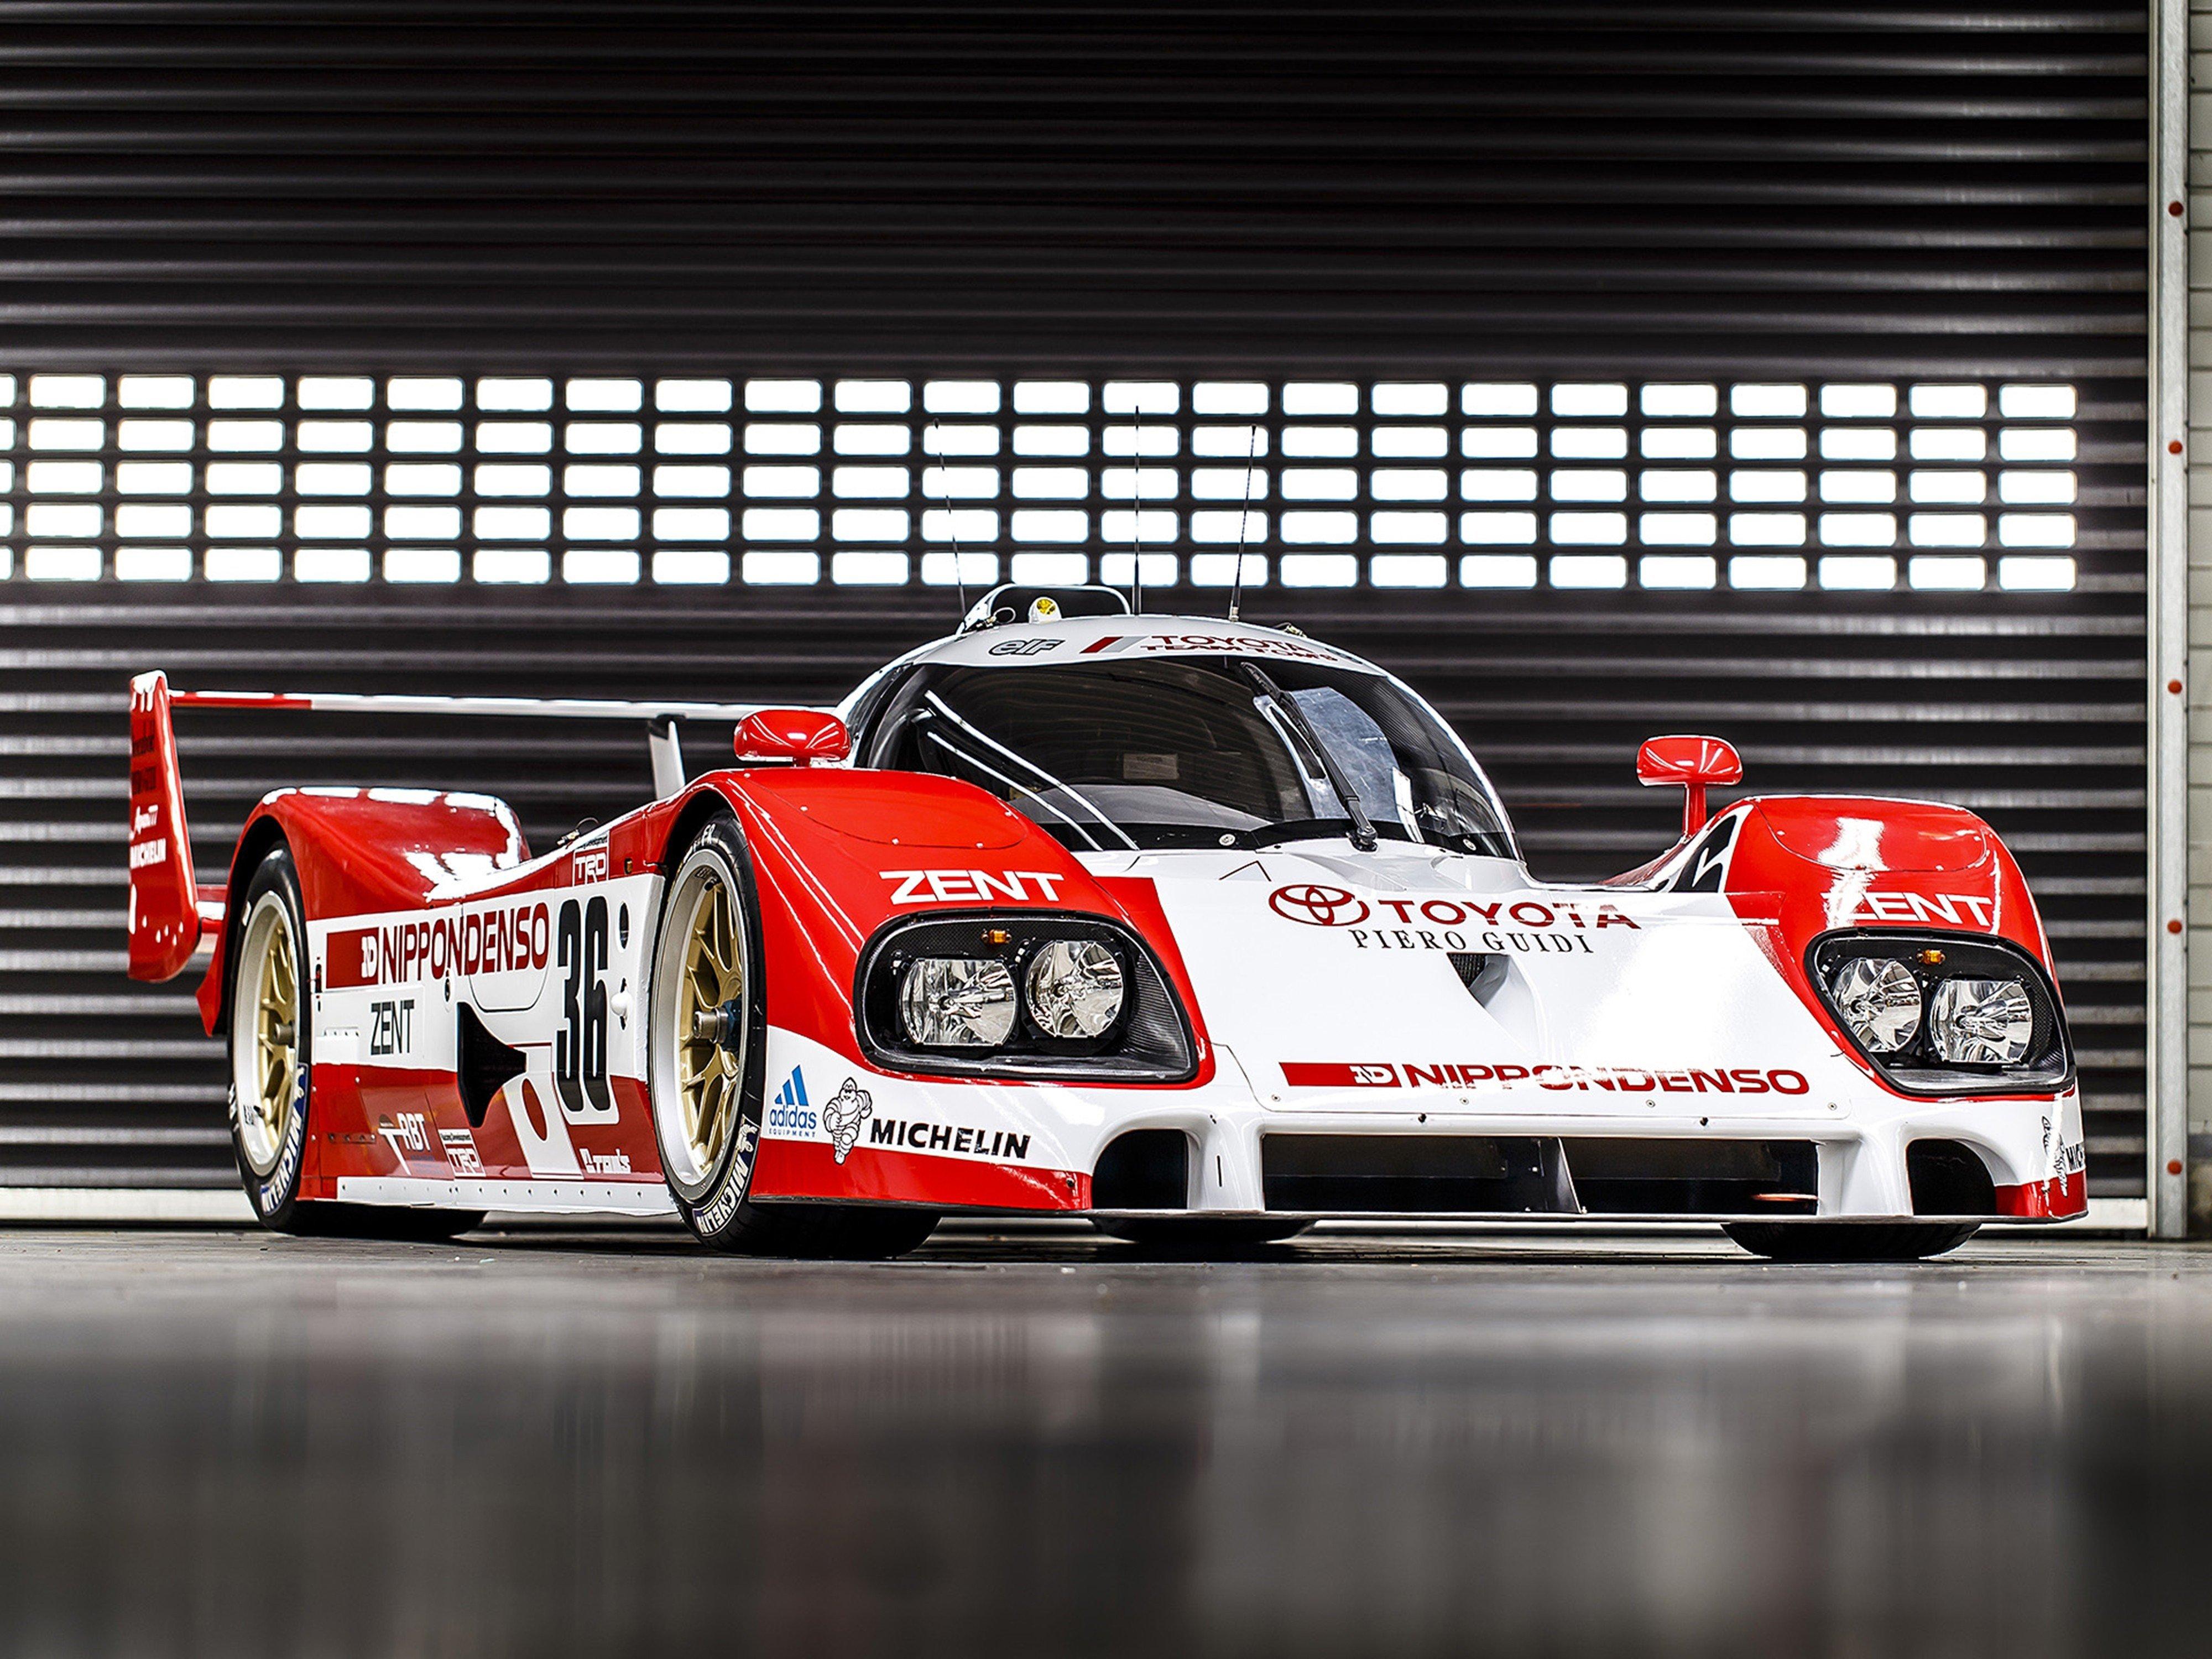 1993 Toyota Ts010 Race Car Classic Vehicle Racing Le Mans